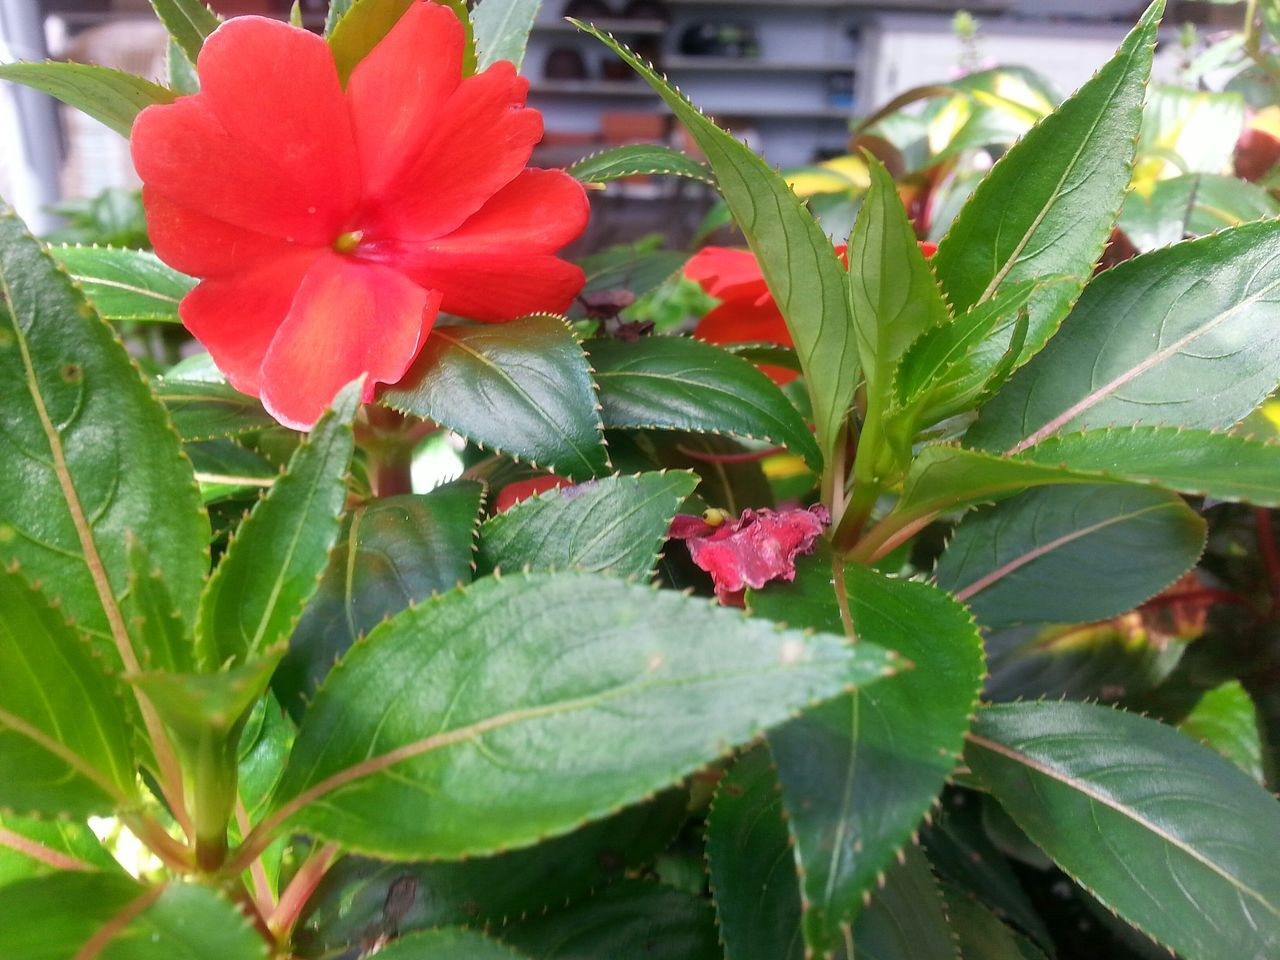 EyeEm Nature Lover Naturelover❤ RedFlower Green Leaves Loverofphotography Loverofnature